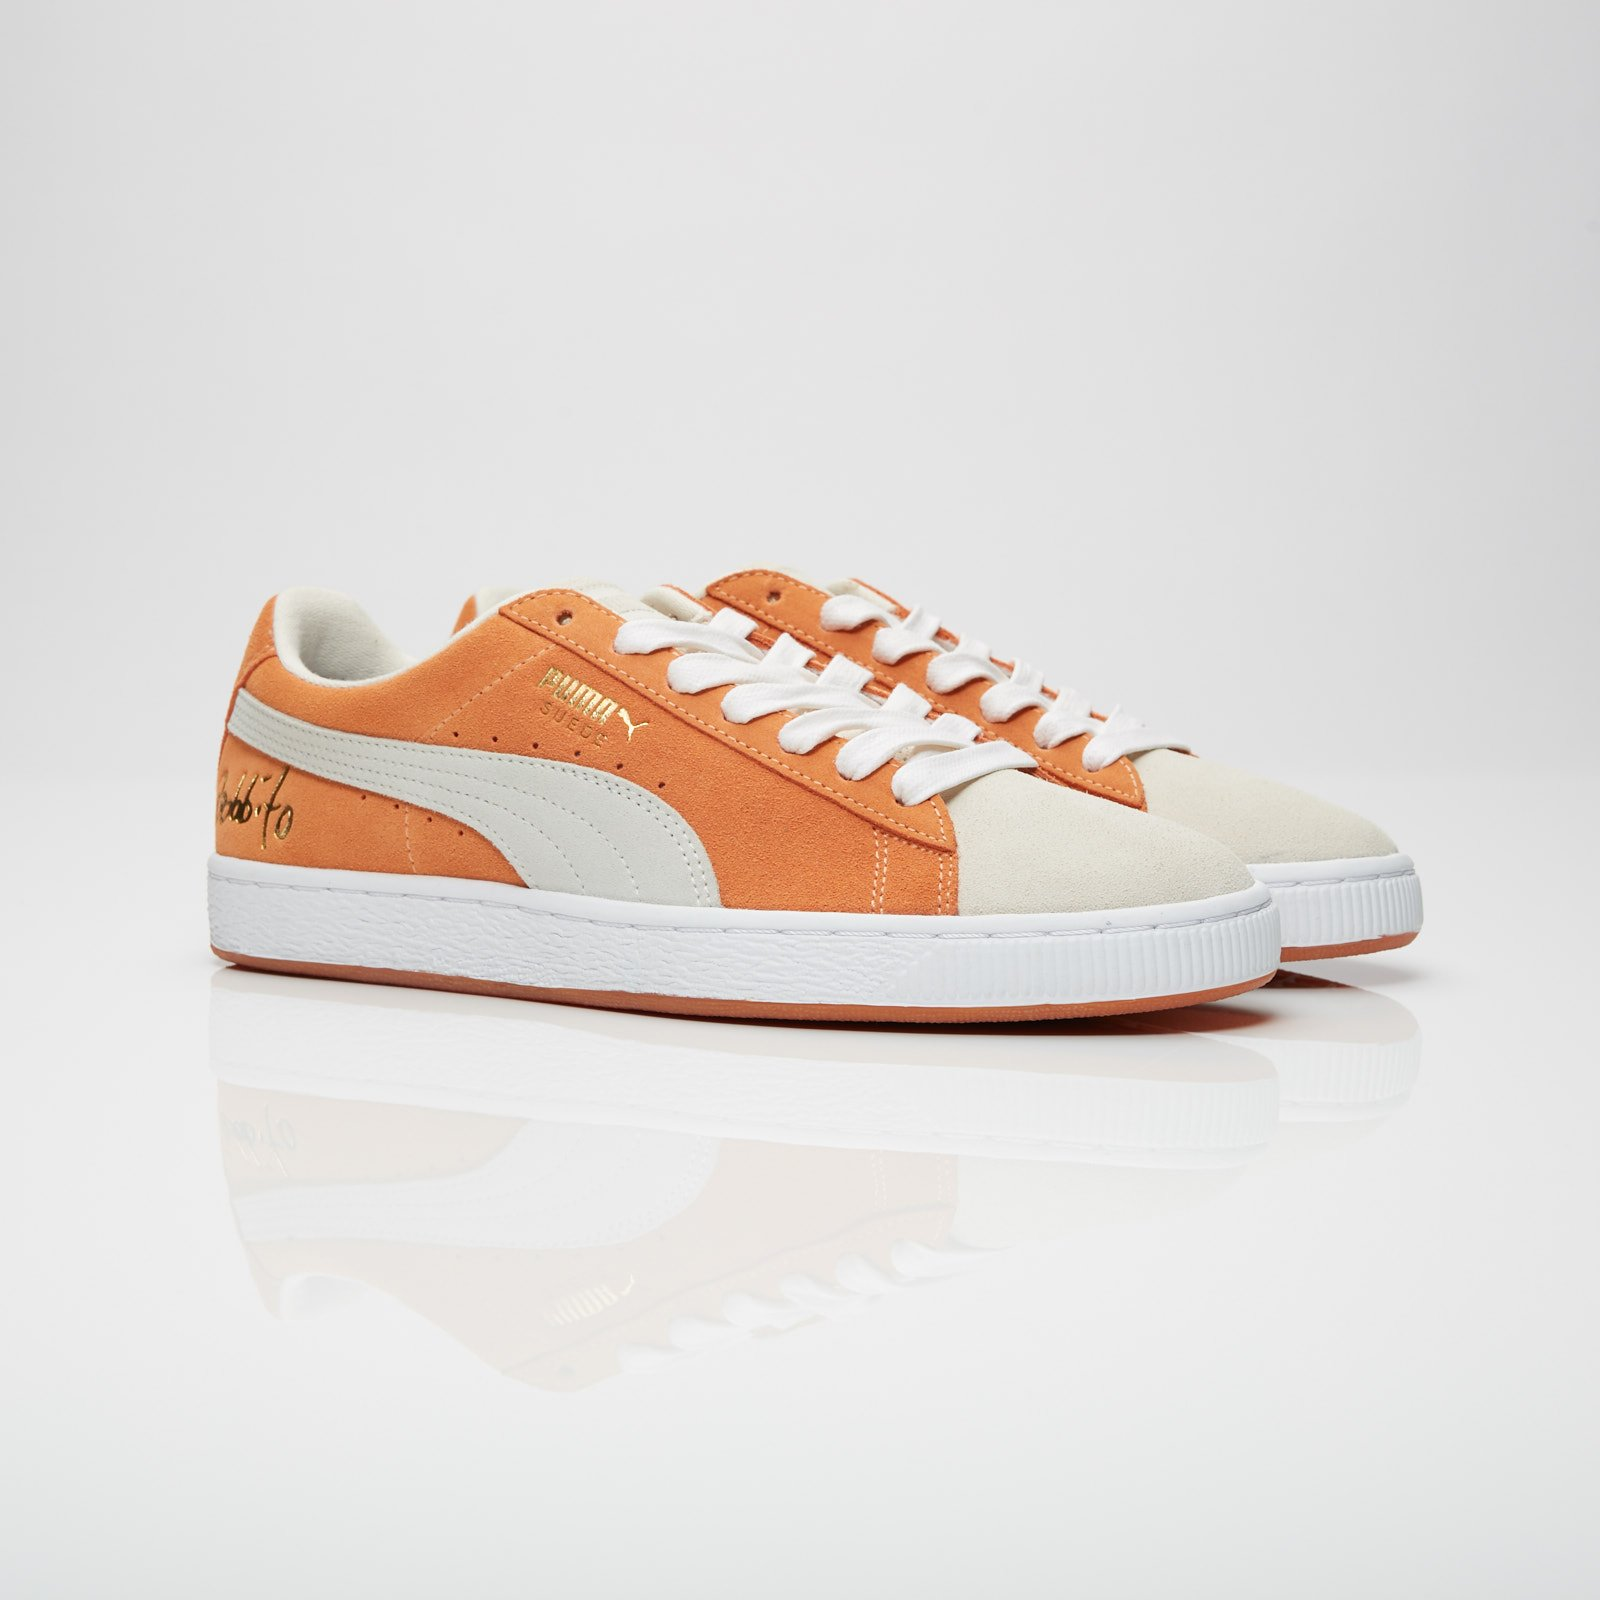 c01ec54d465 Puma Suede Classic x Bobbito - 366336-01 - Sneakersnstuff | sneakers ...